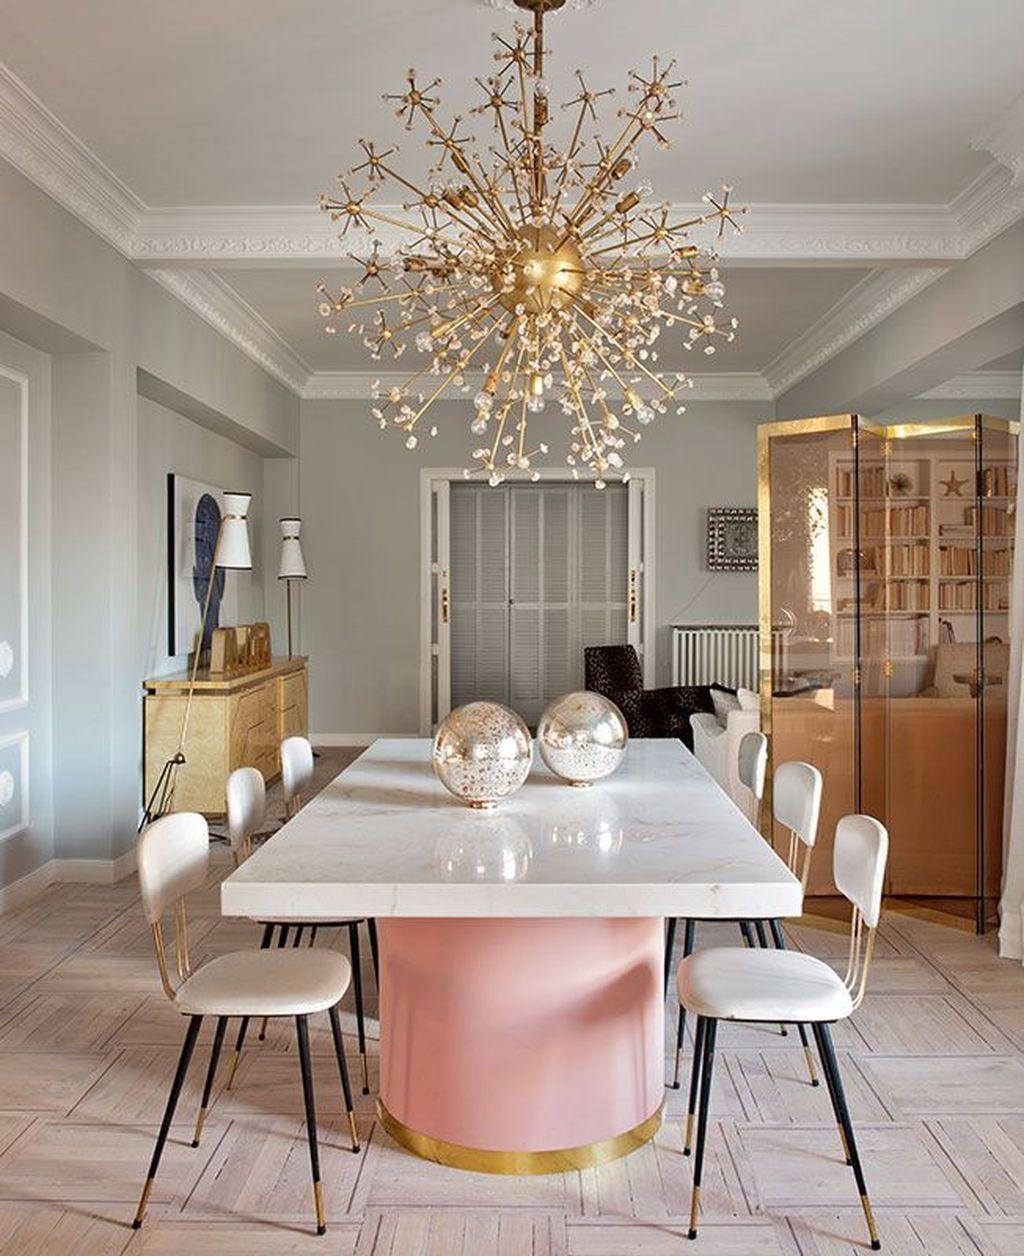 35 Luxury Dining Room Design Ideas: 35 Feminine Dining Room Design Ideas